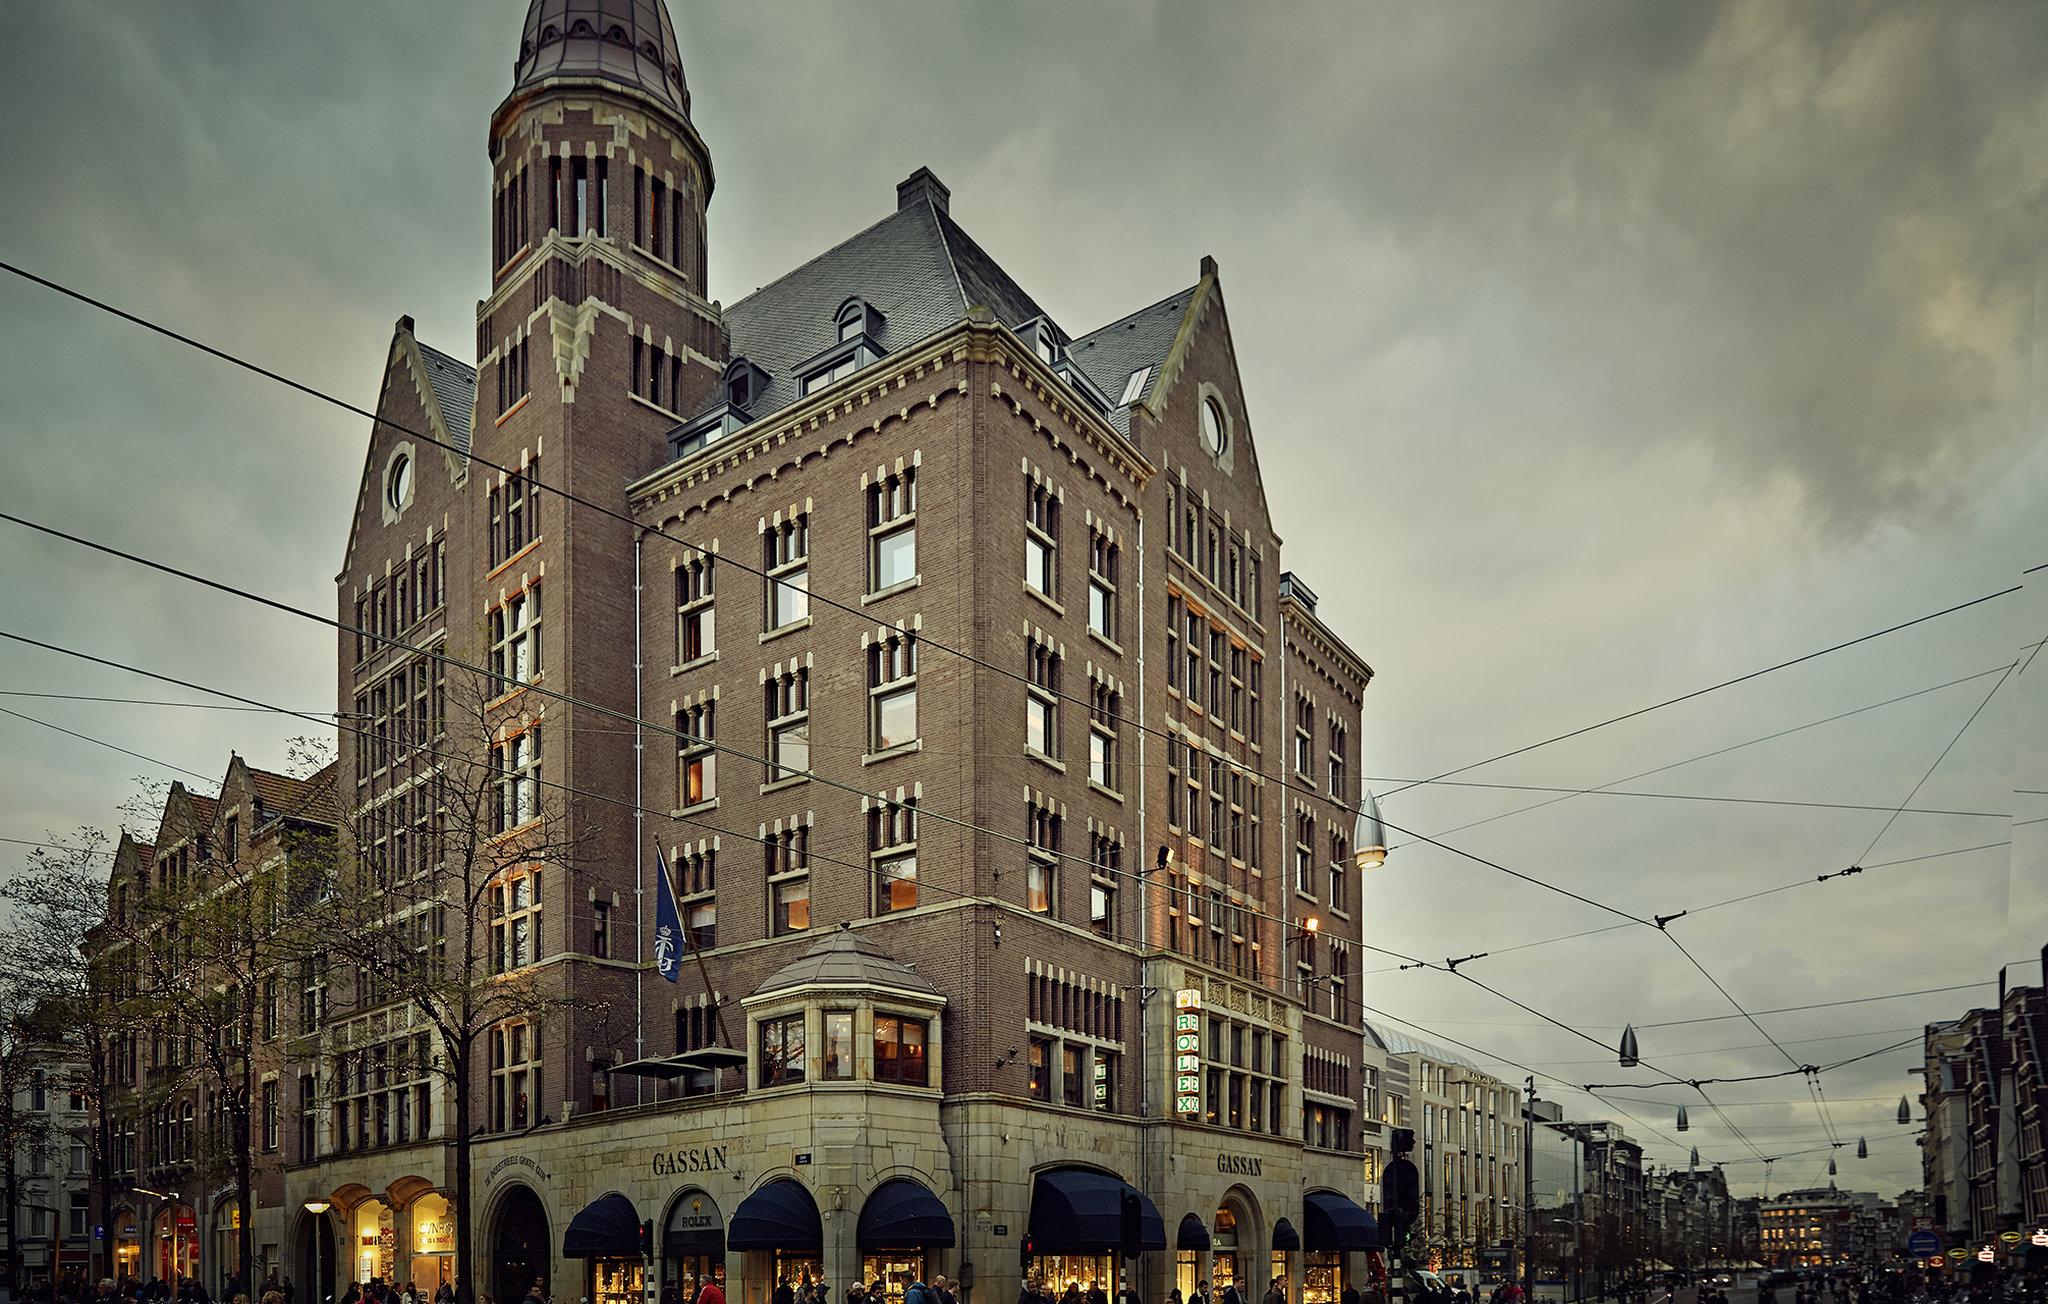 TwentySeven Hotel